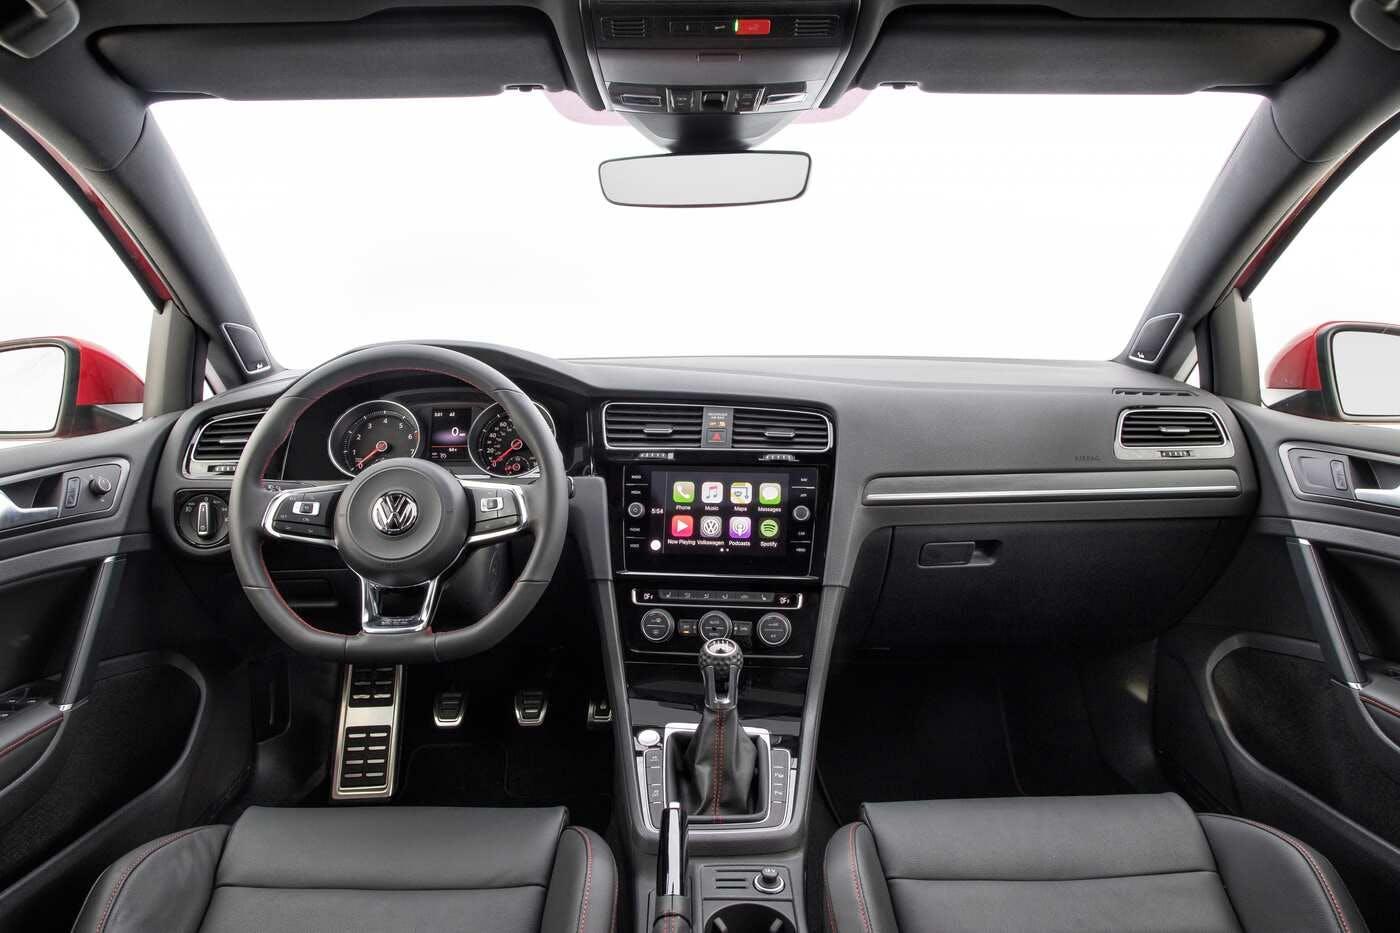 2020 Volkswagen Golf Gti Reviews Pricing Pictures Truecar